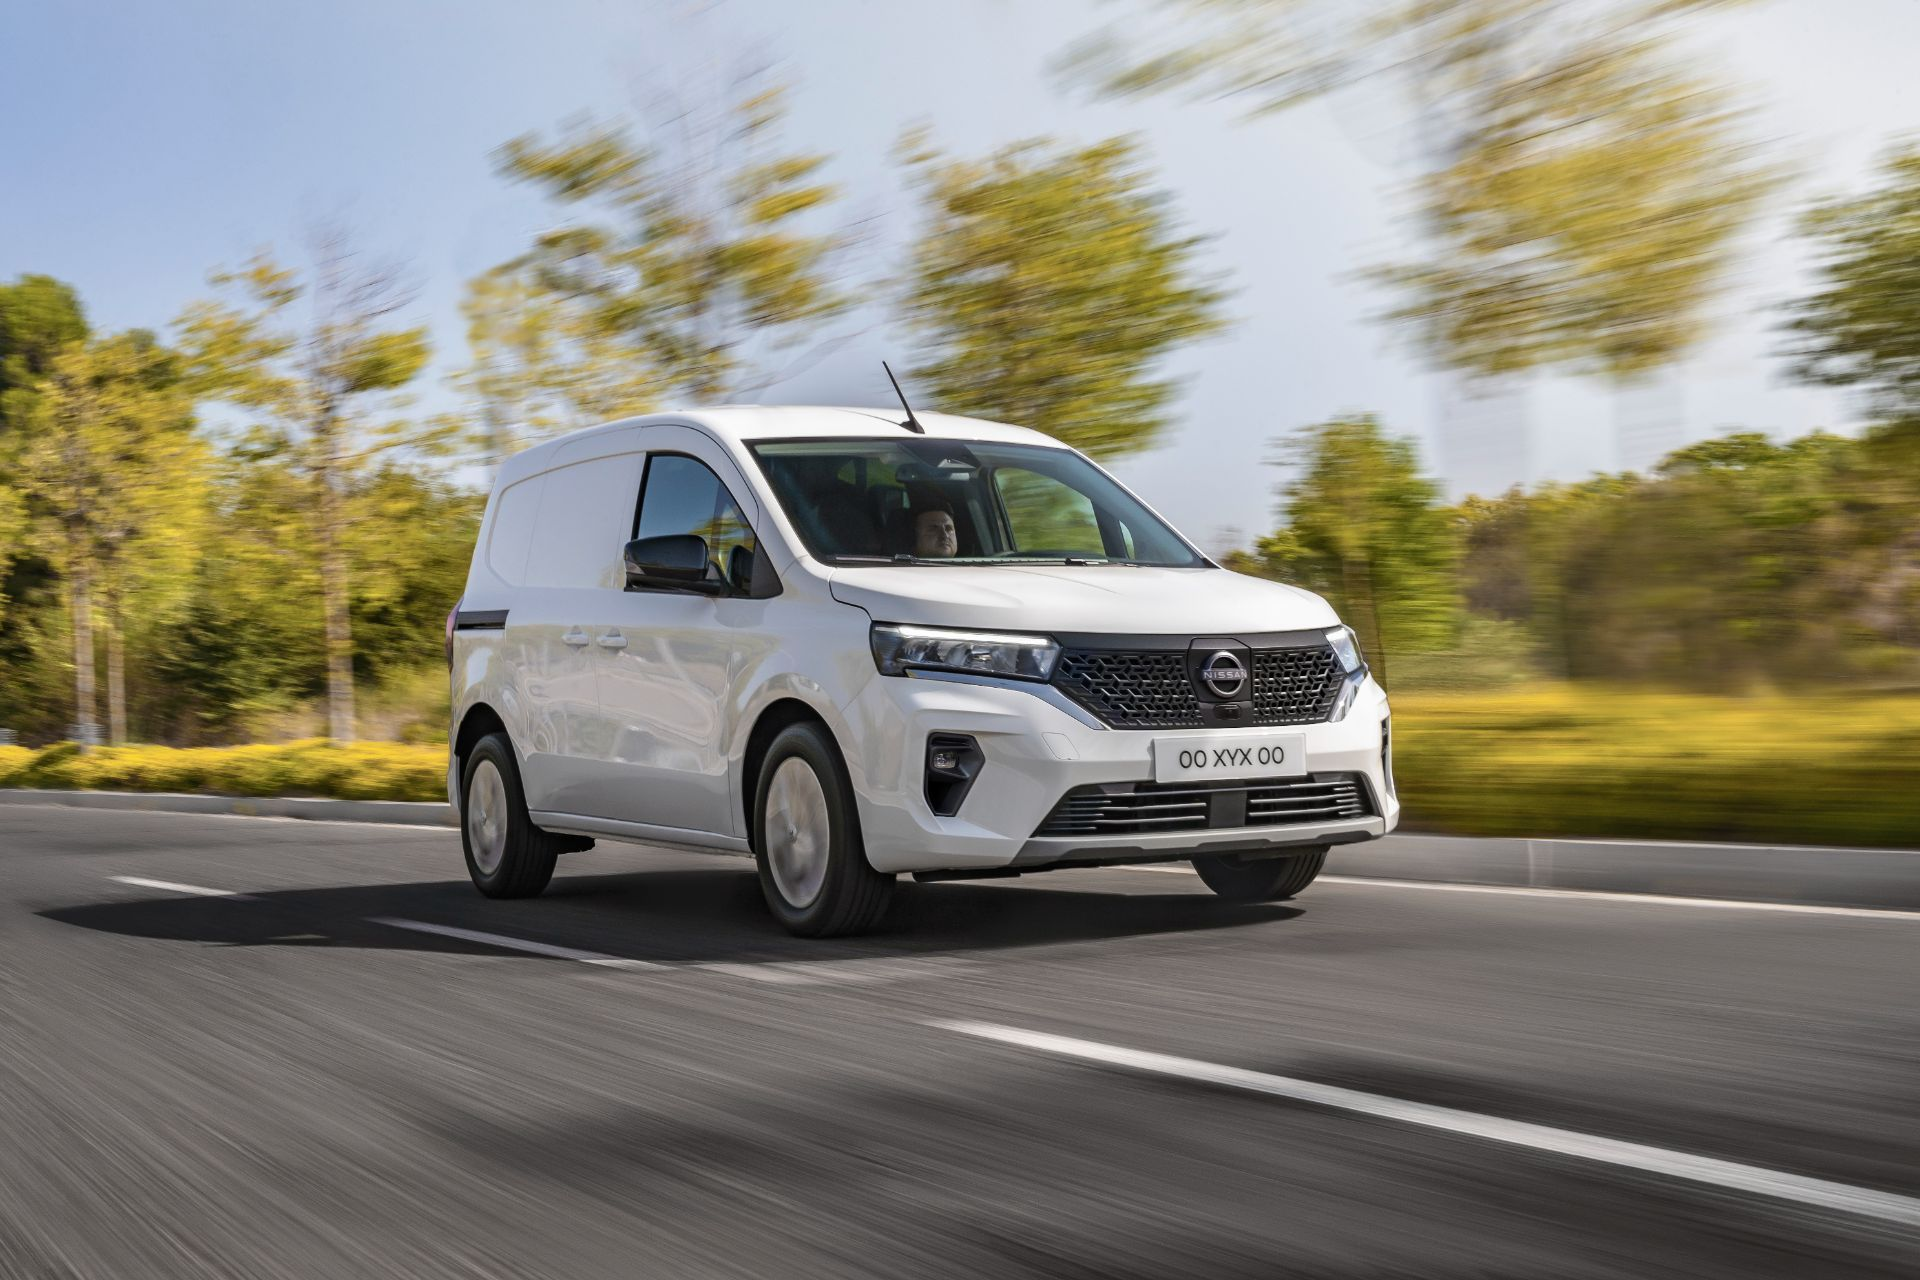 2022-Nissan-Townstar-EV-van-dynamic-2